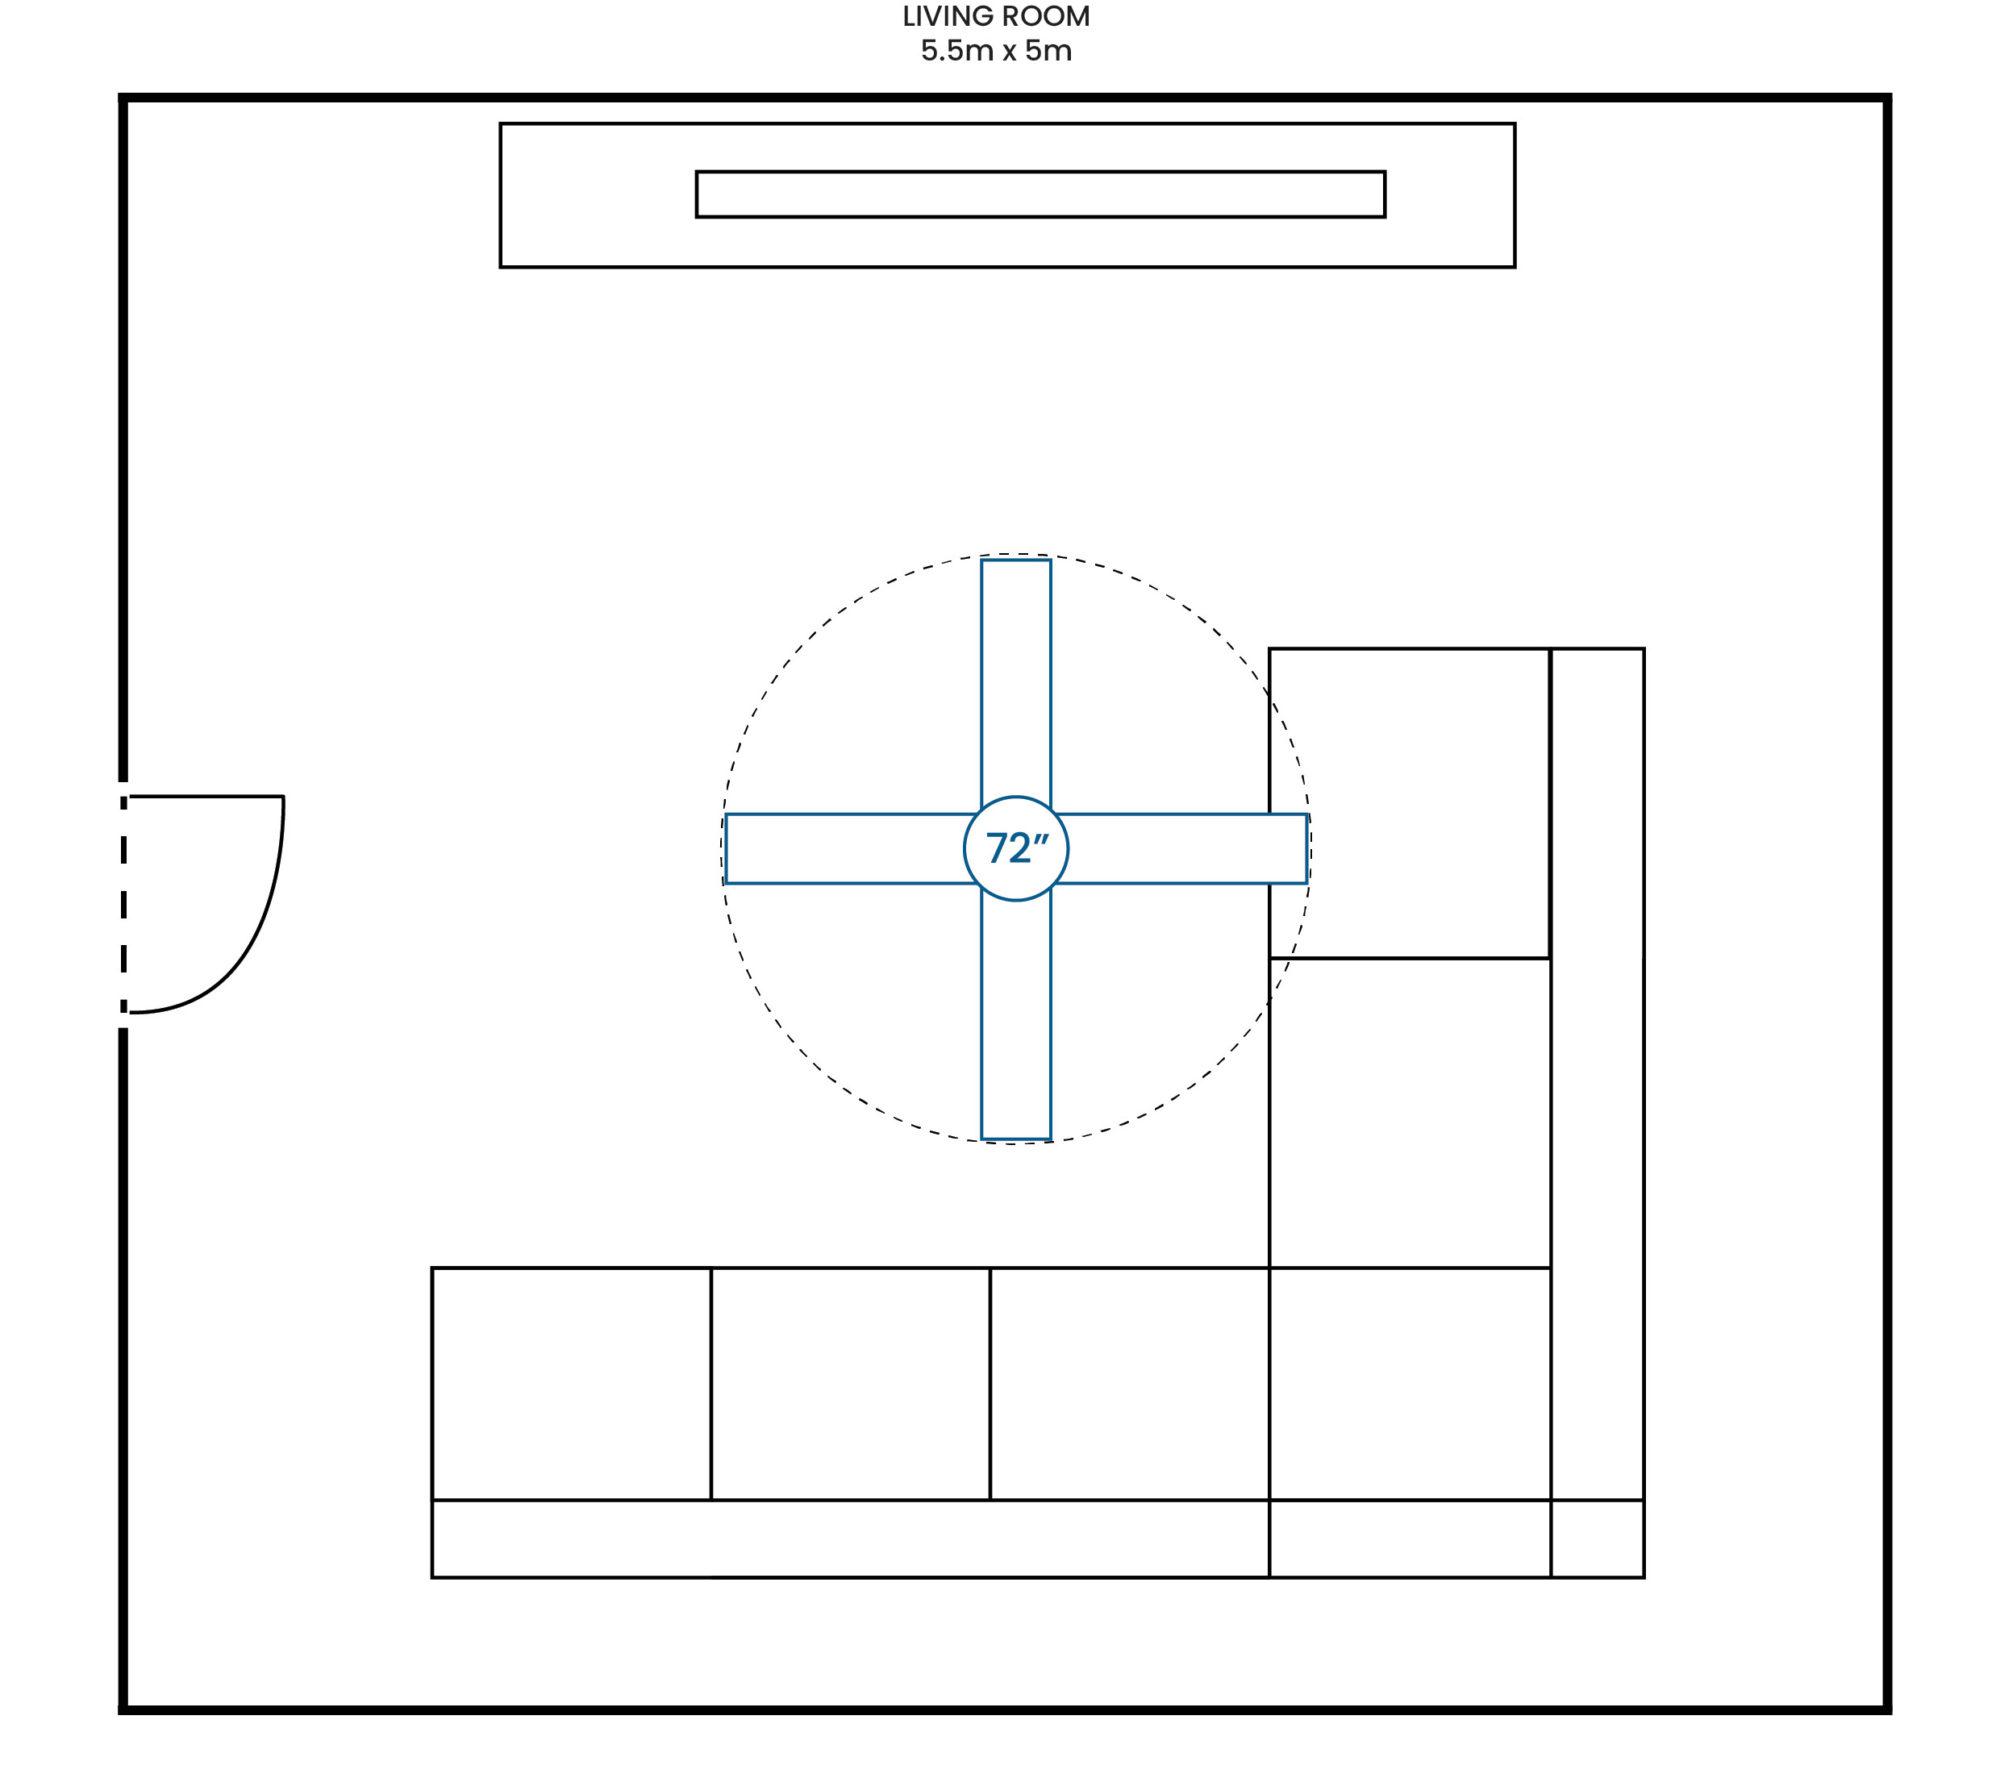 Living Room 550 500 72F